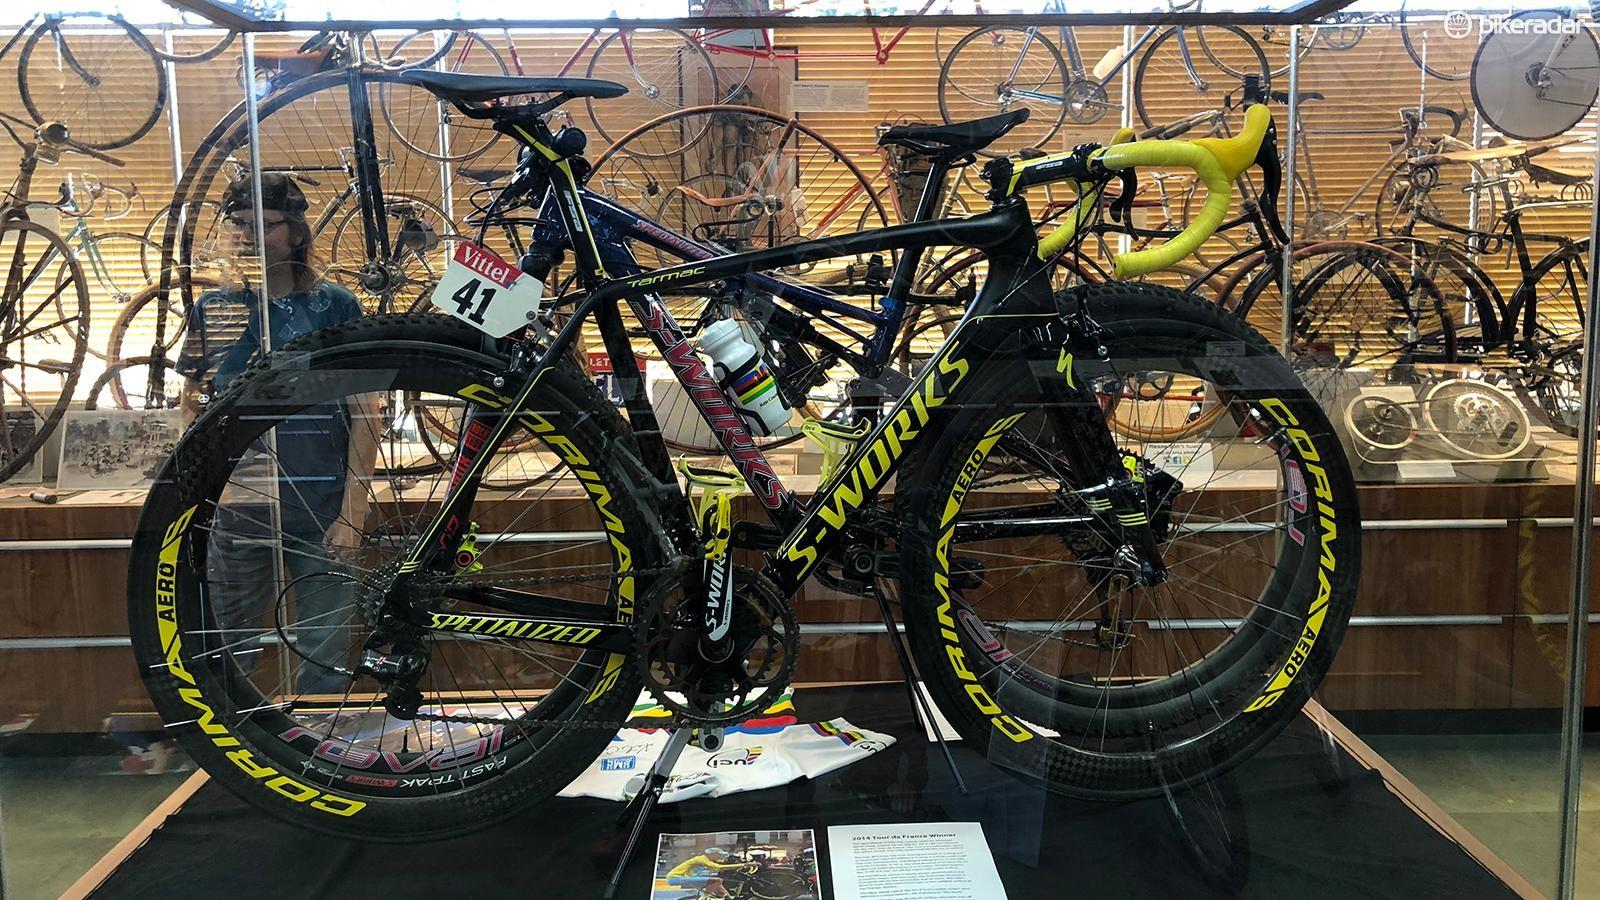 Vincenzo Nibali's 2014 Tour-de-France-winning S-Works Tarmac